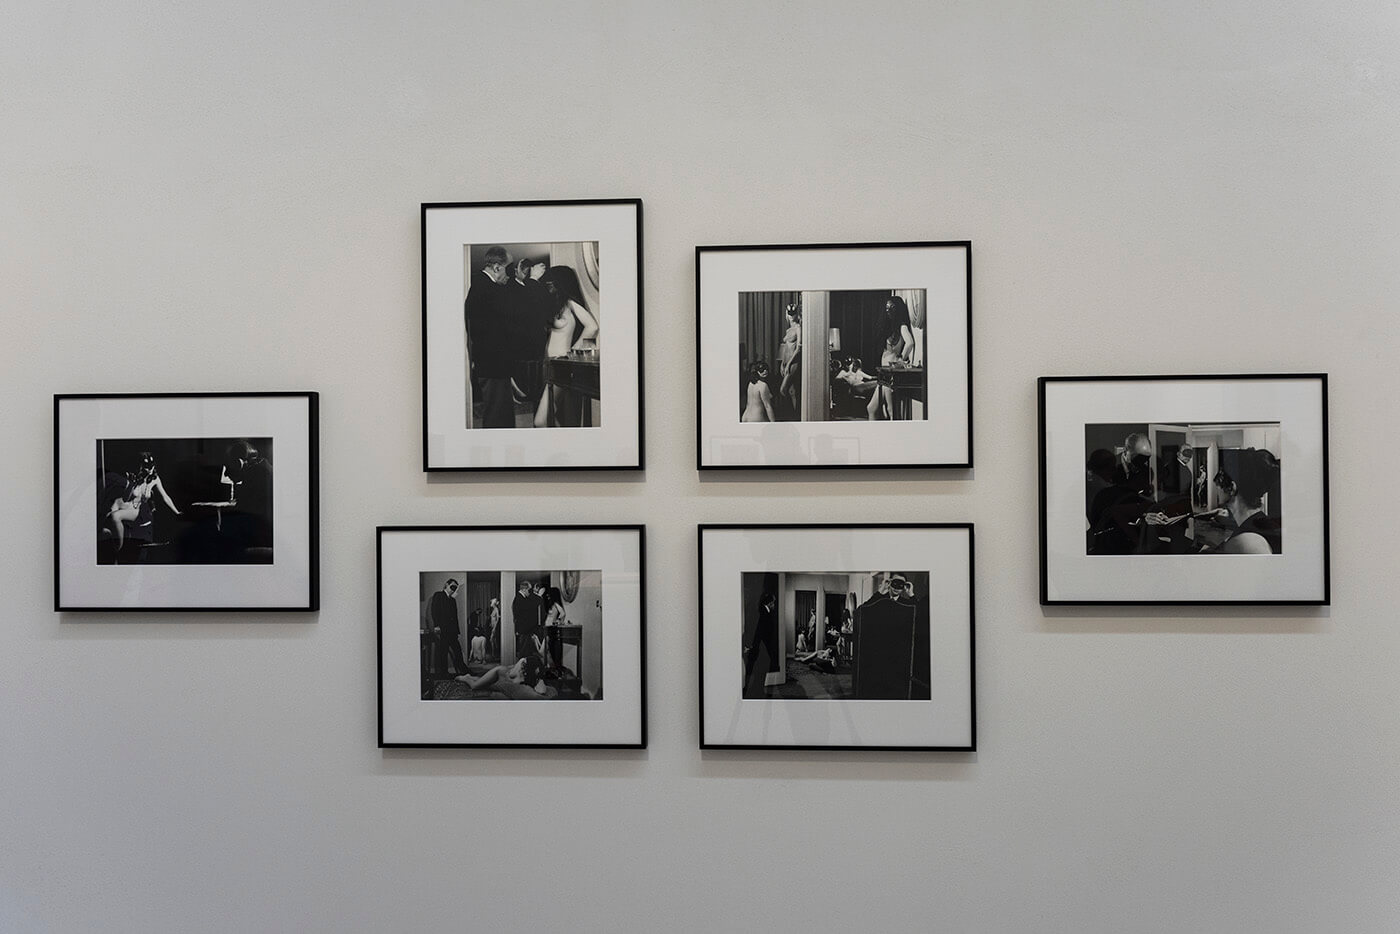 documenta 14 Milan Soremski Soremski Design, Fotografie und Film